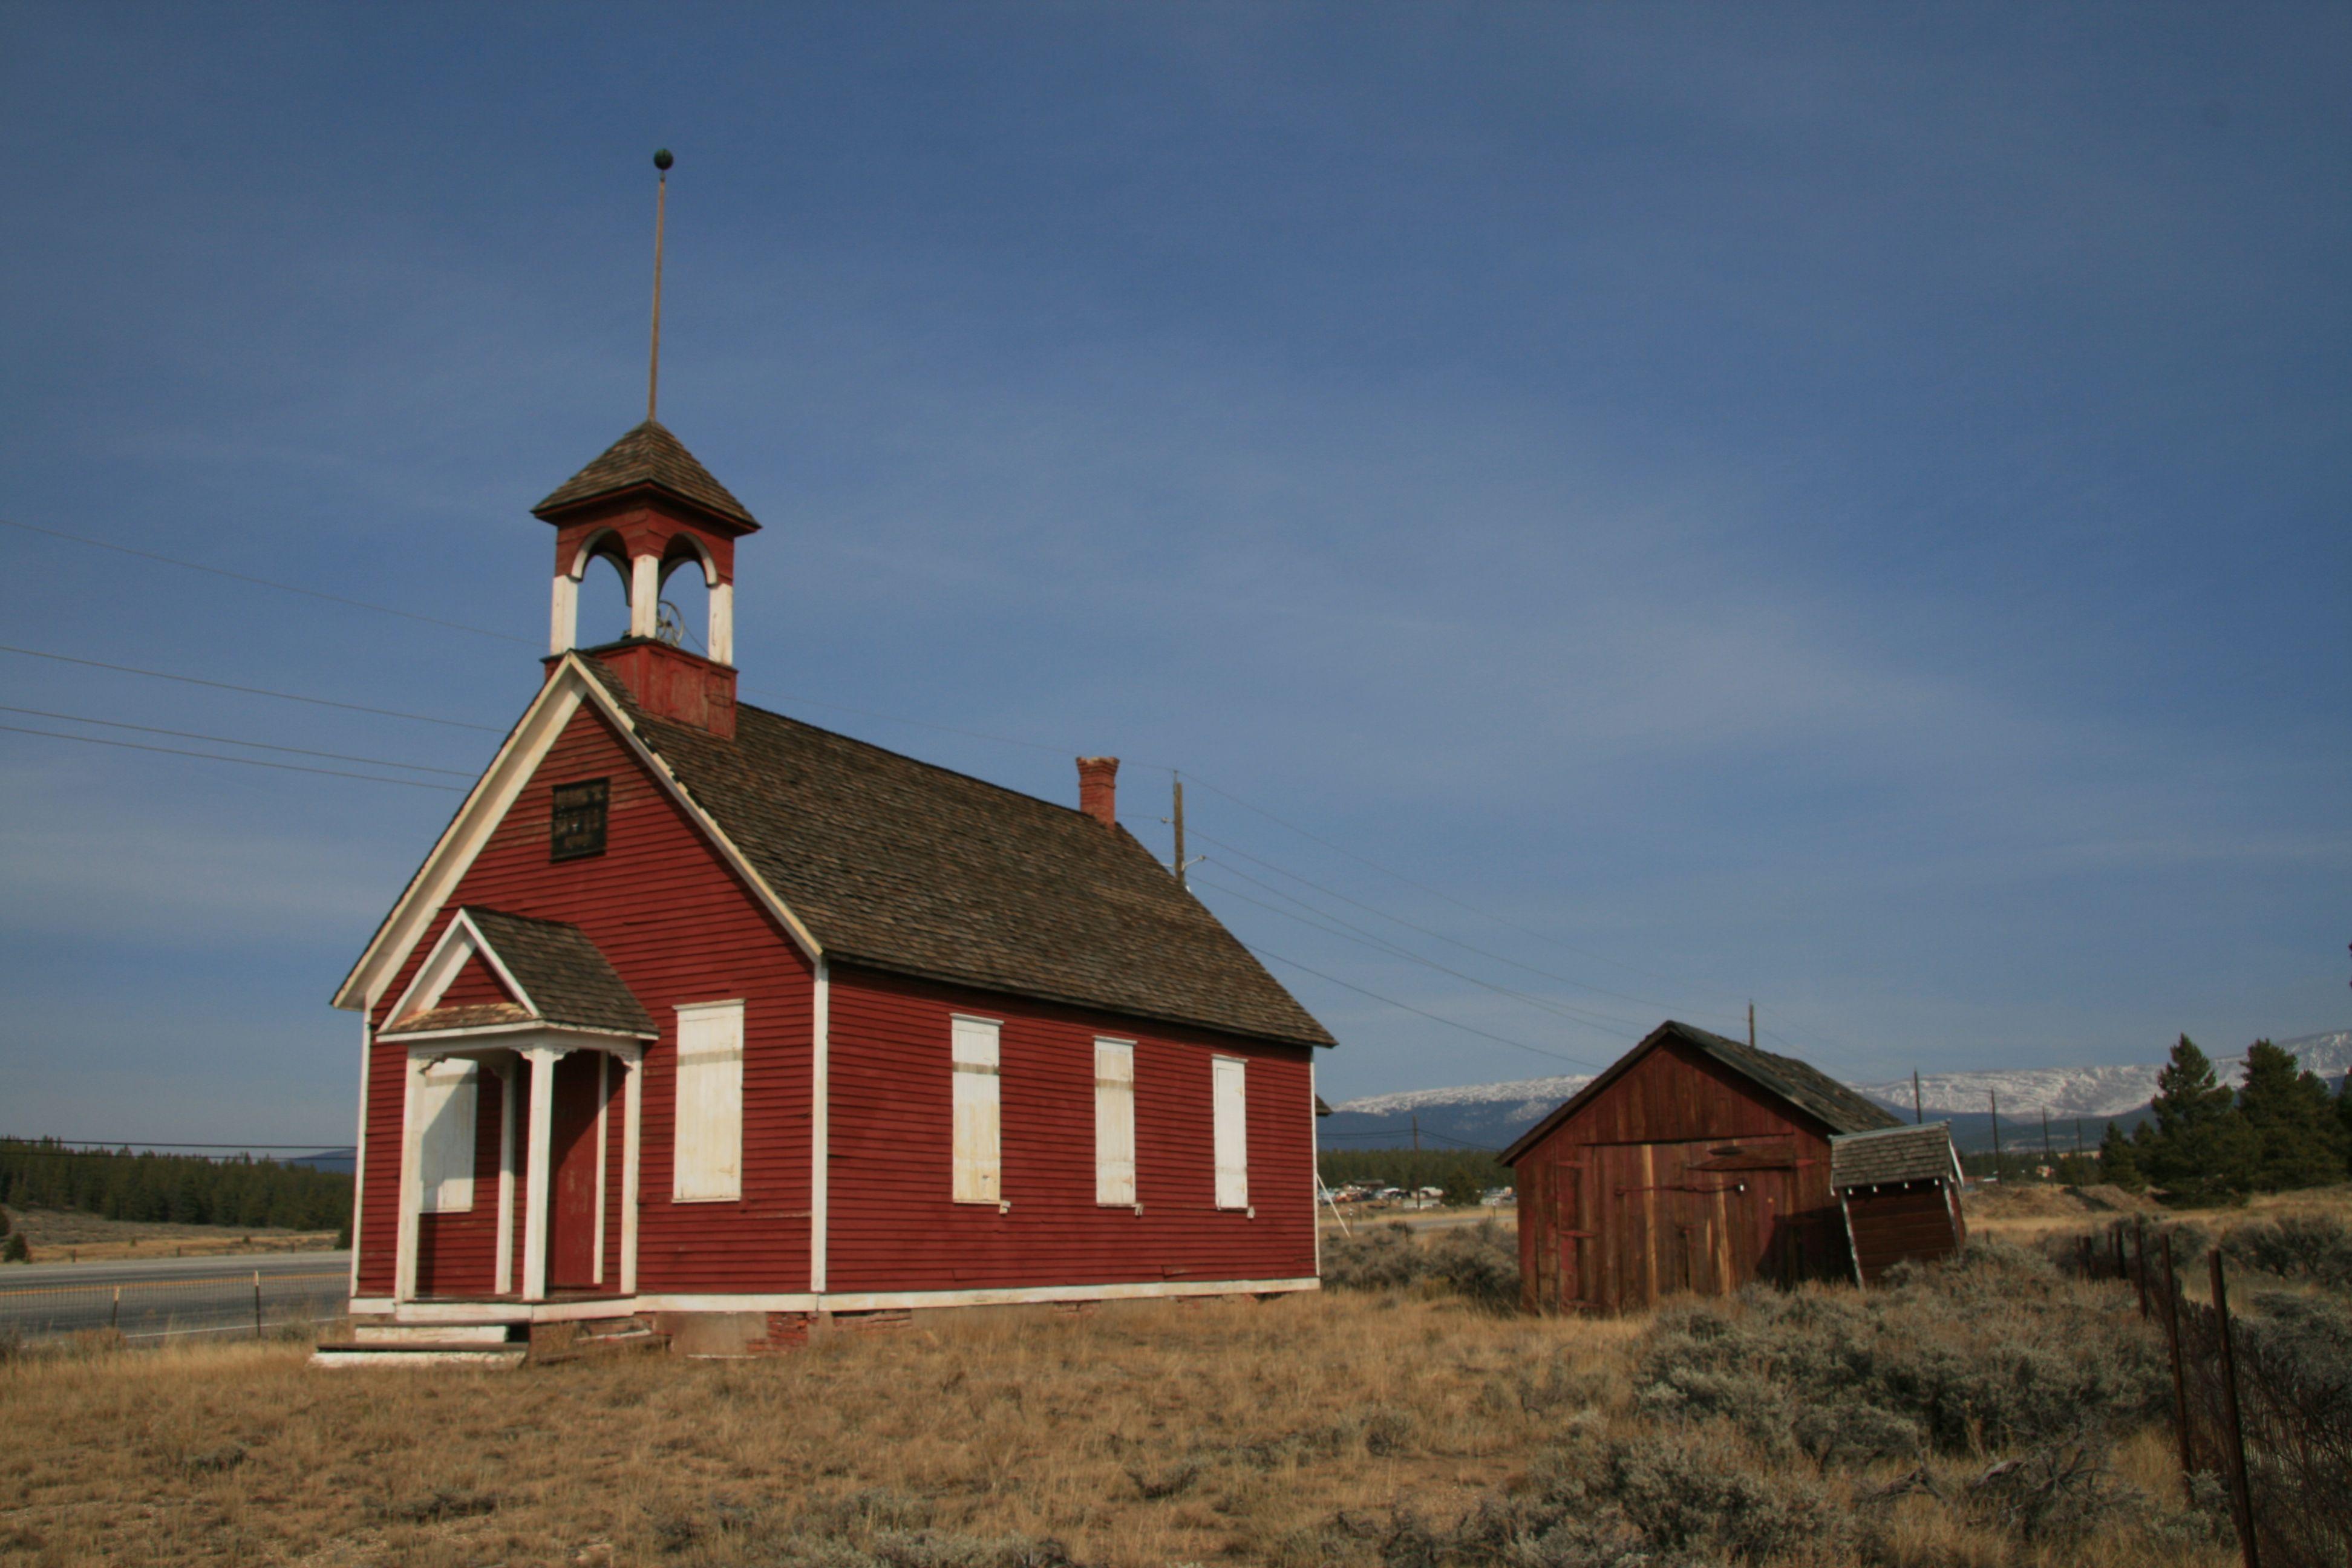 Old School House in Leadville, Colorado Old school house